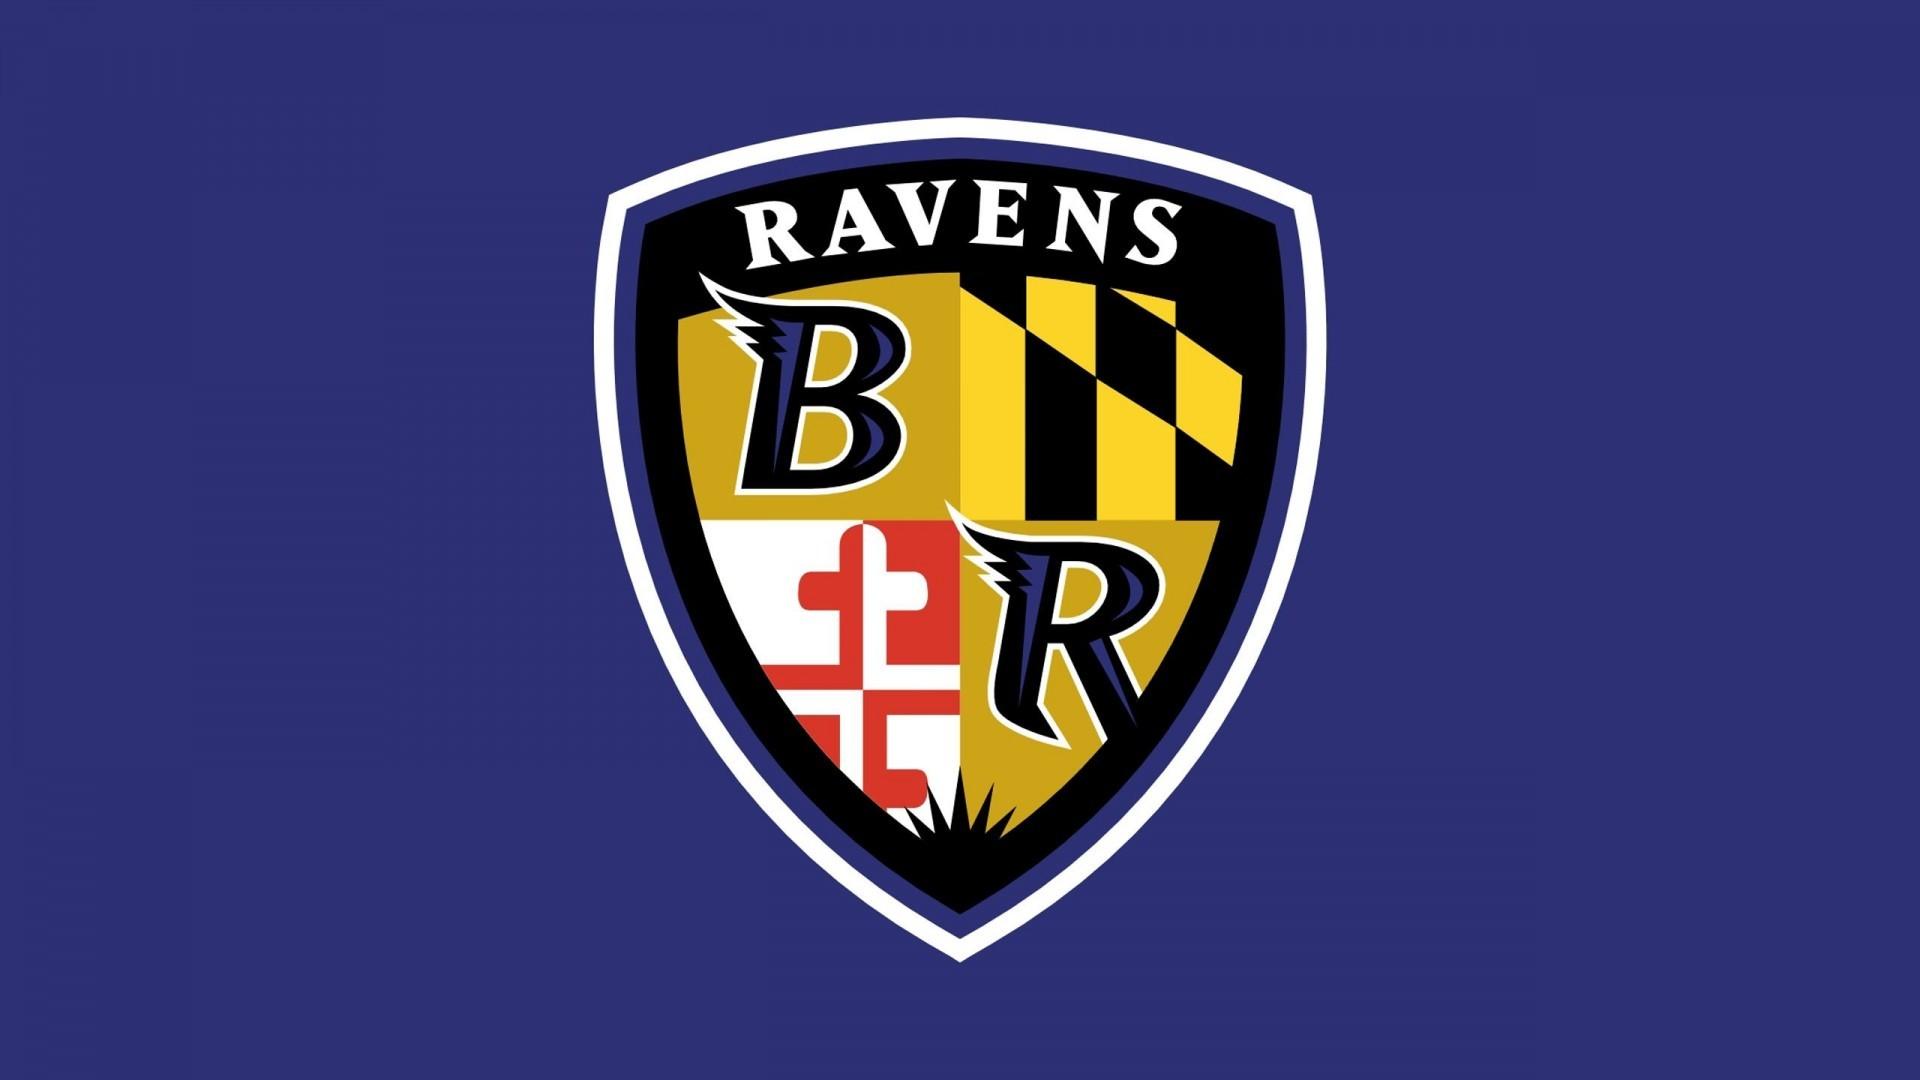 Baltimore Ravens HD k Schedule Wallpaper 1920×1080 Baltimore Ravens  Wallpaper (40 Wallpapers)